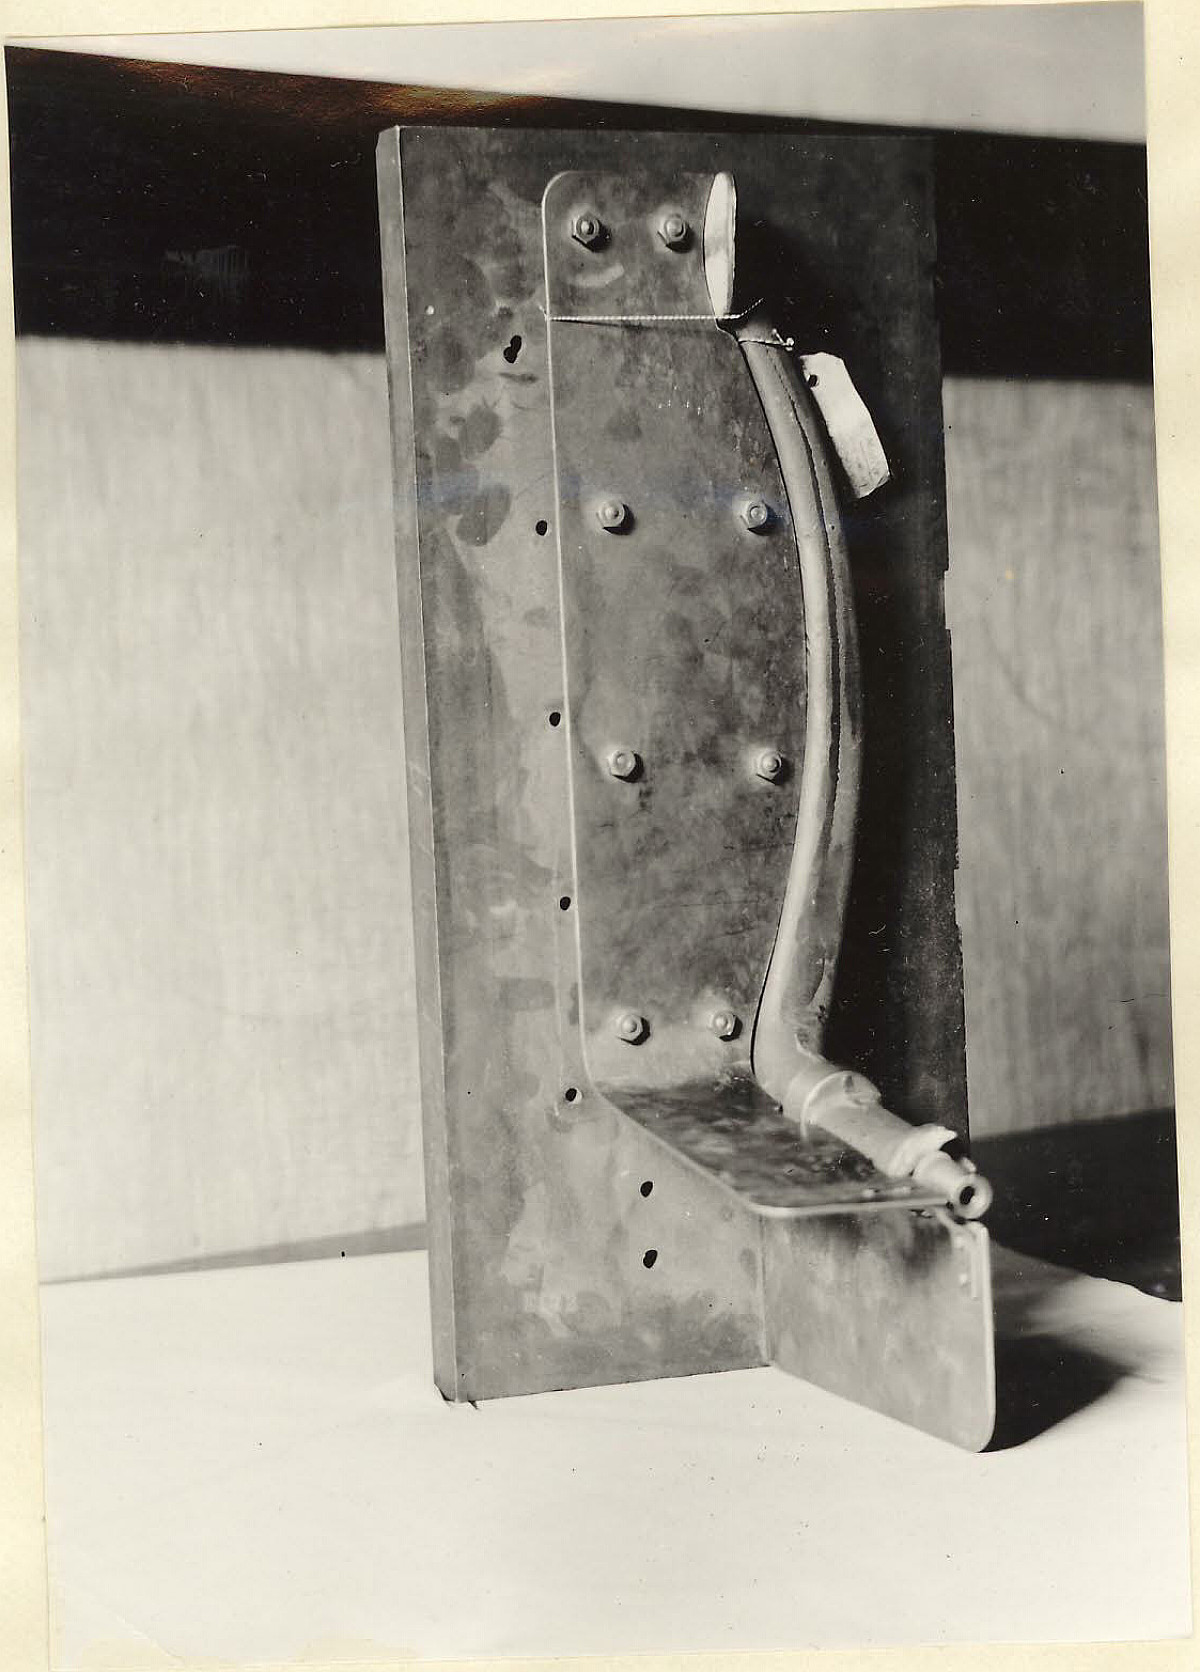 GFA 24/53.1327: Gage for EMDA foot lever